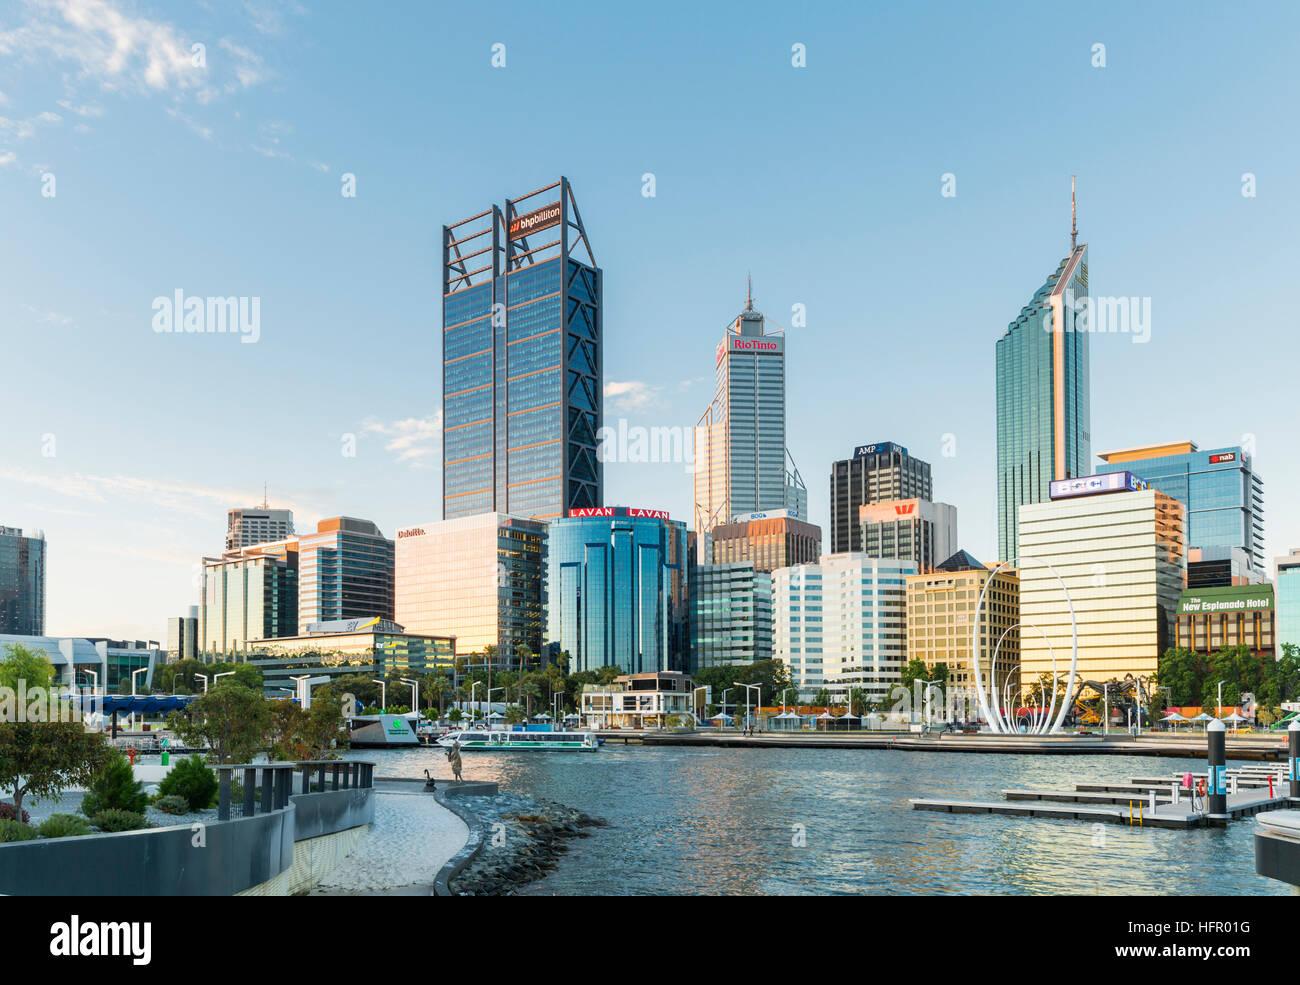 View across to the waterfront precinct of Elizabeth Quay to the city skyline beyond, Perth, Western Australia, Australia - Stock Image